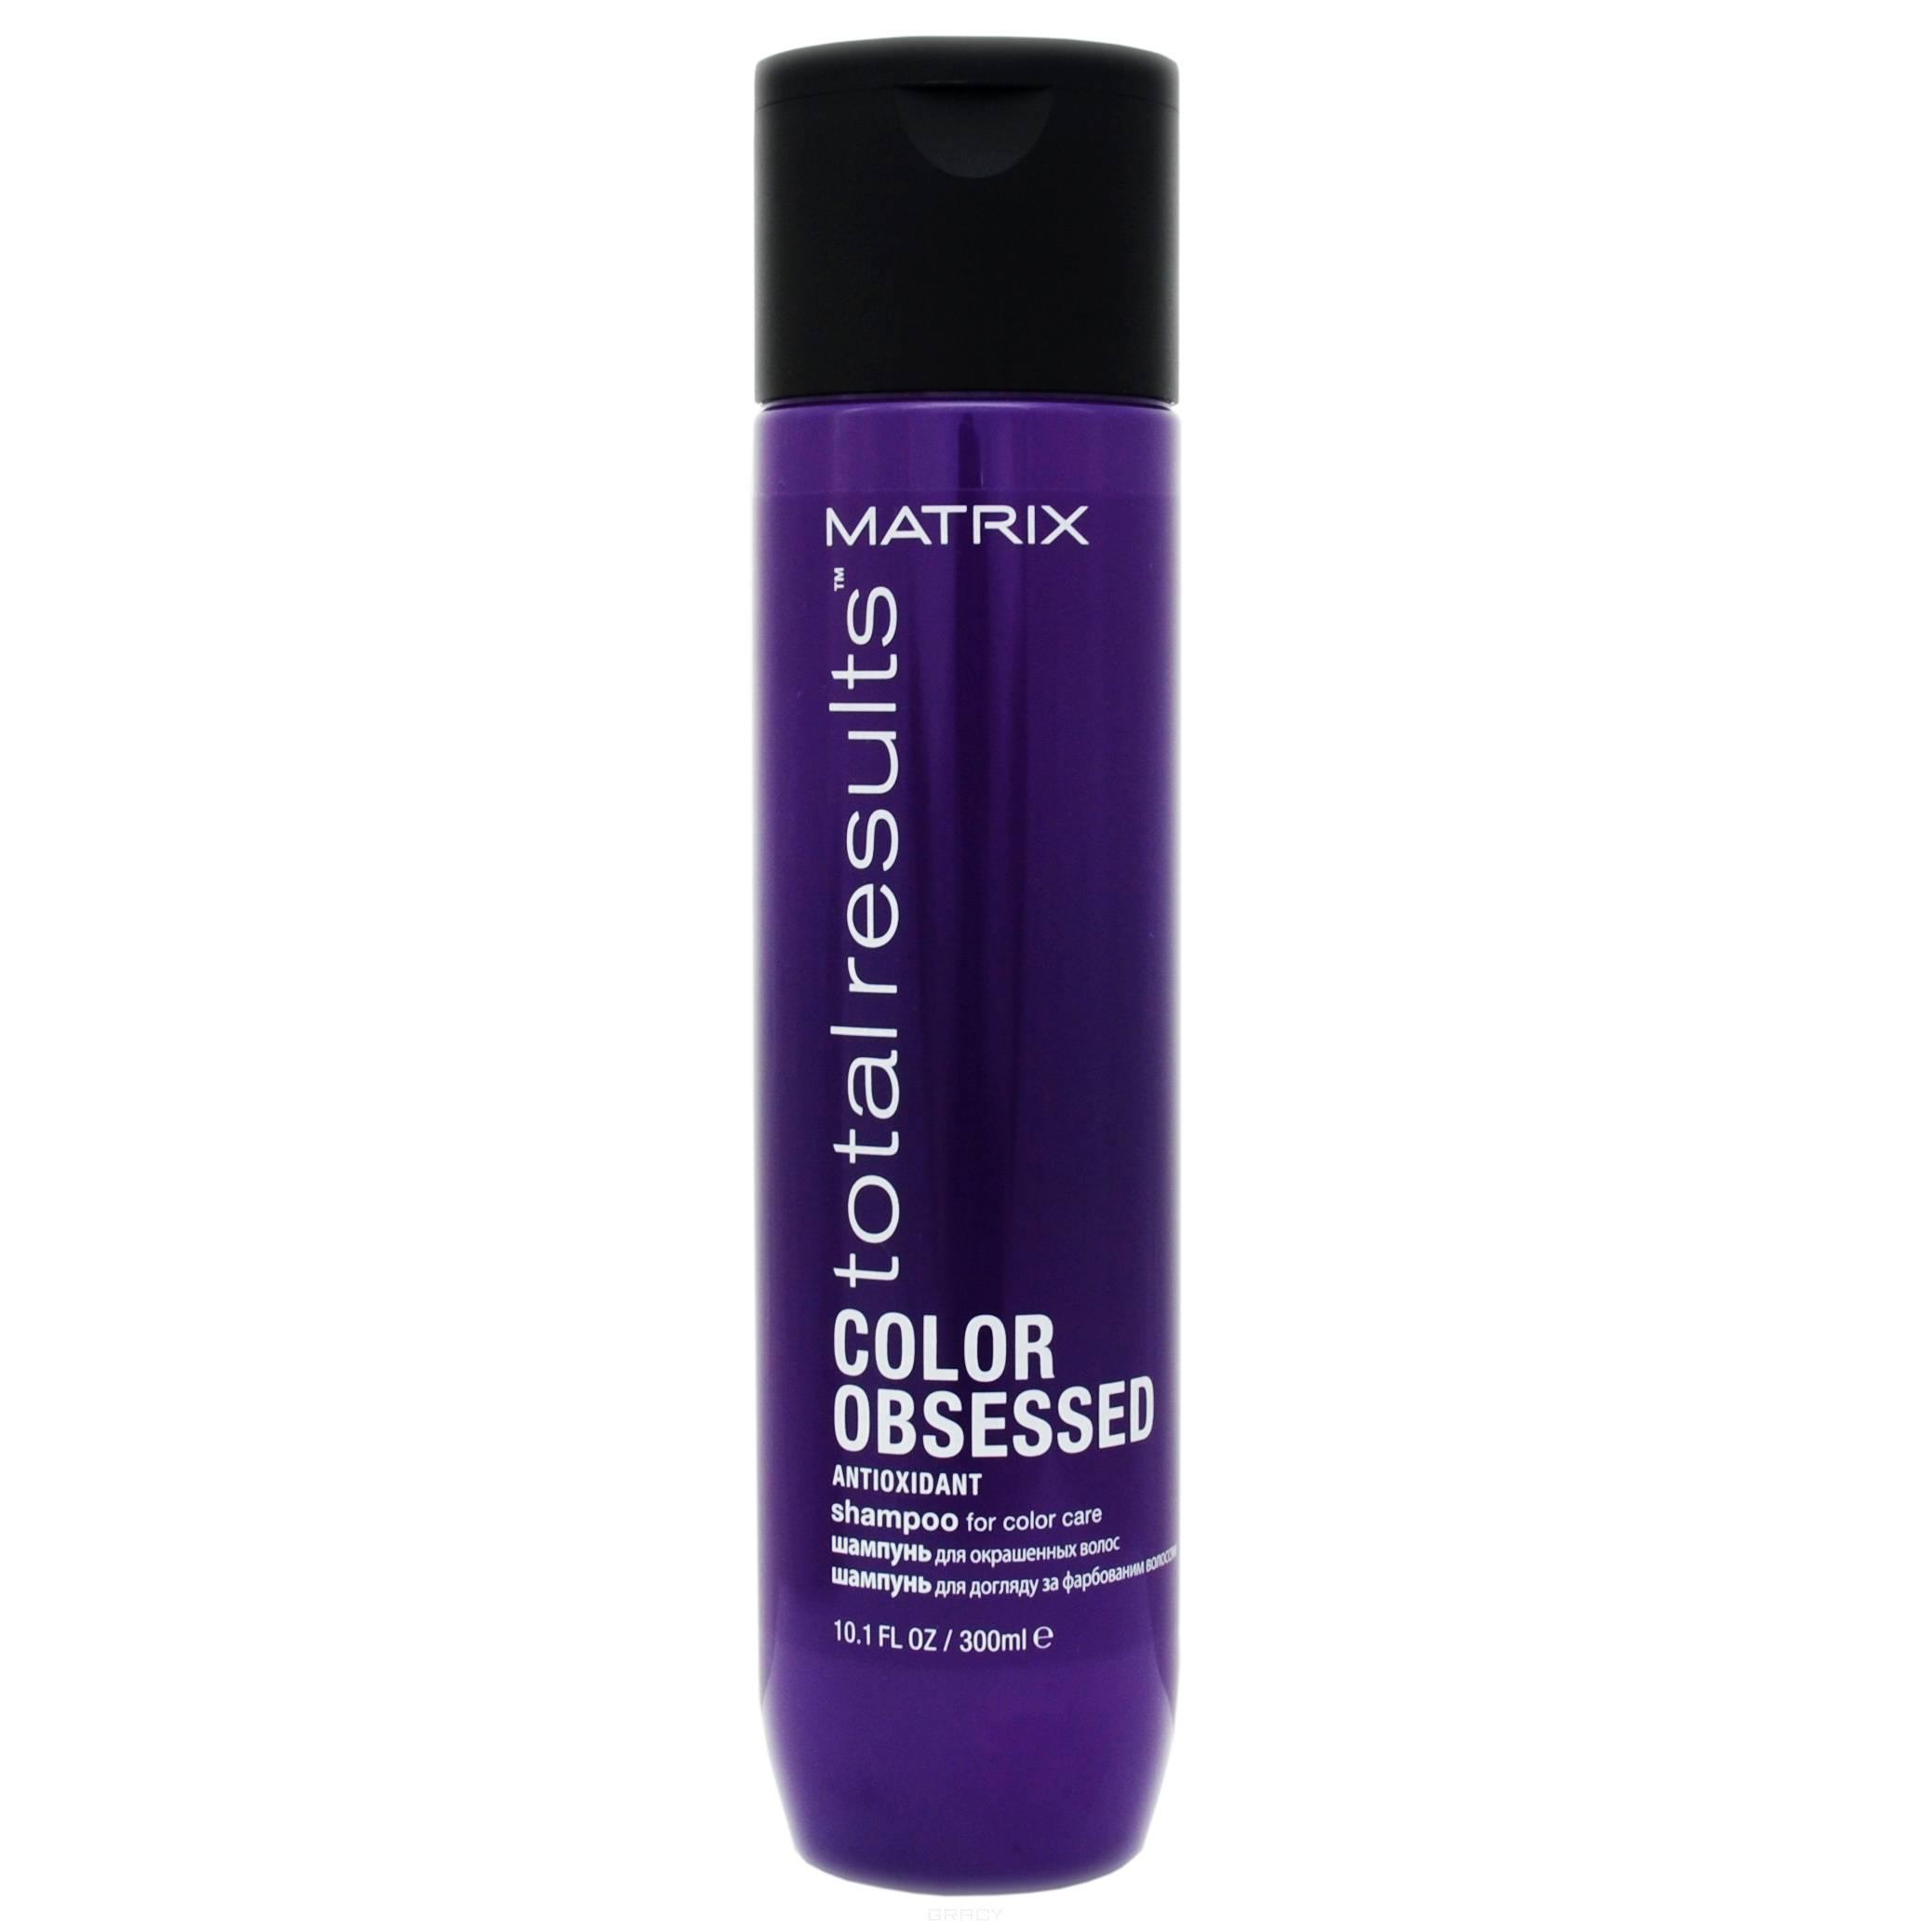 Matrix, Набор дуопак шампунь + масло для окрашенных волос Color Obsessed Shampoo + Oil Wonders (- 50% на масло), 300 мл +125 мл шампунь дав для окрашенных волос отзывы